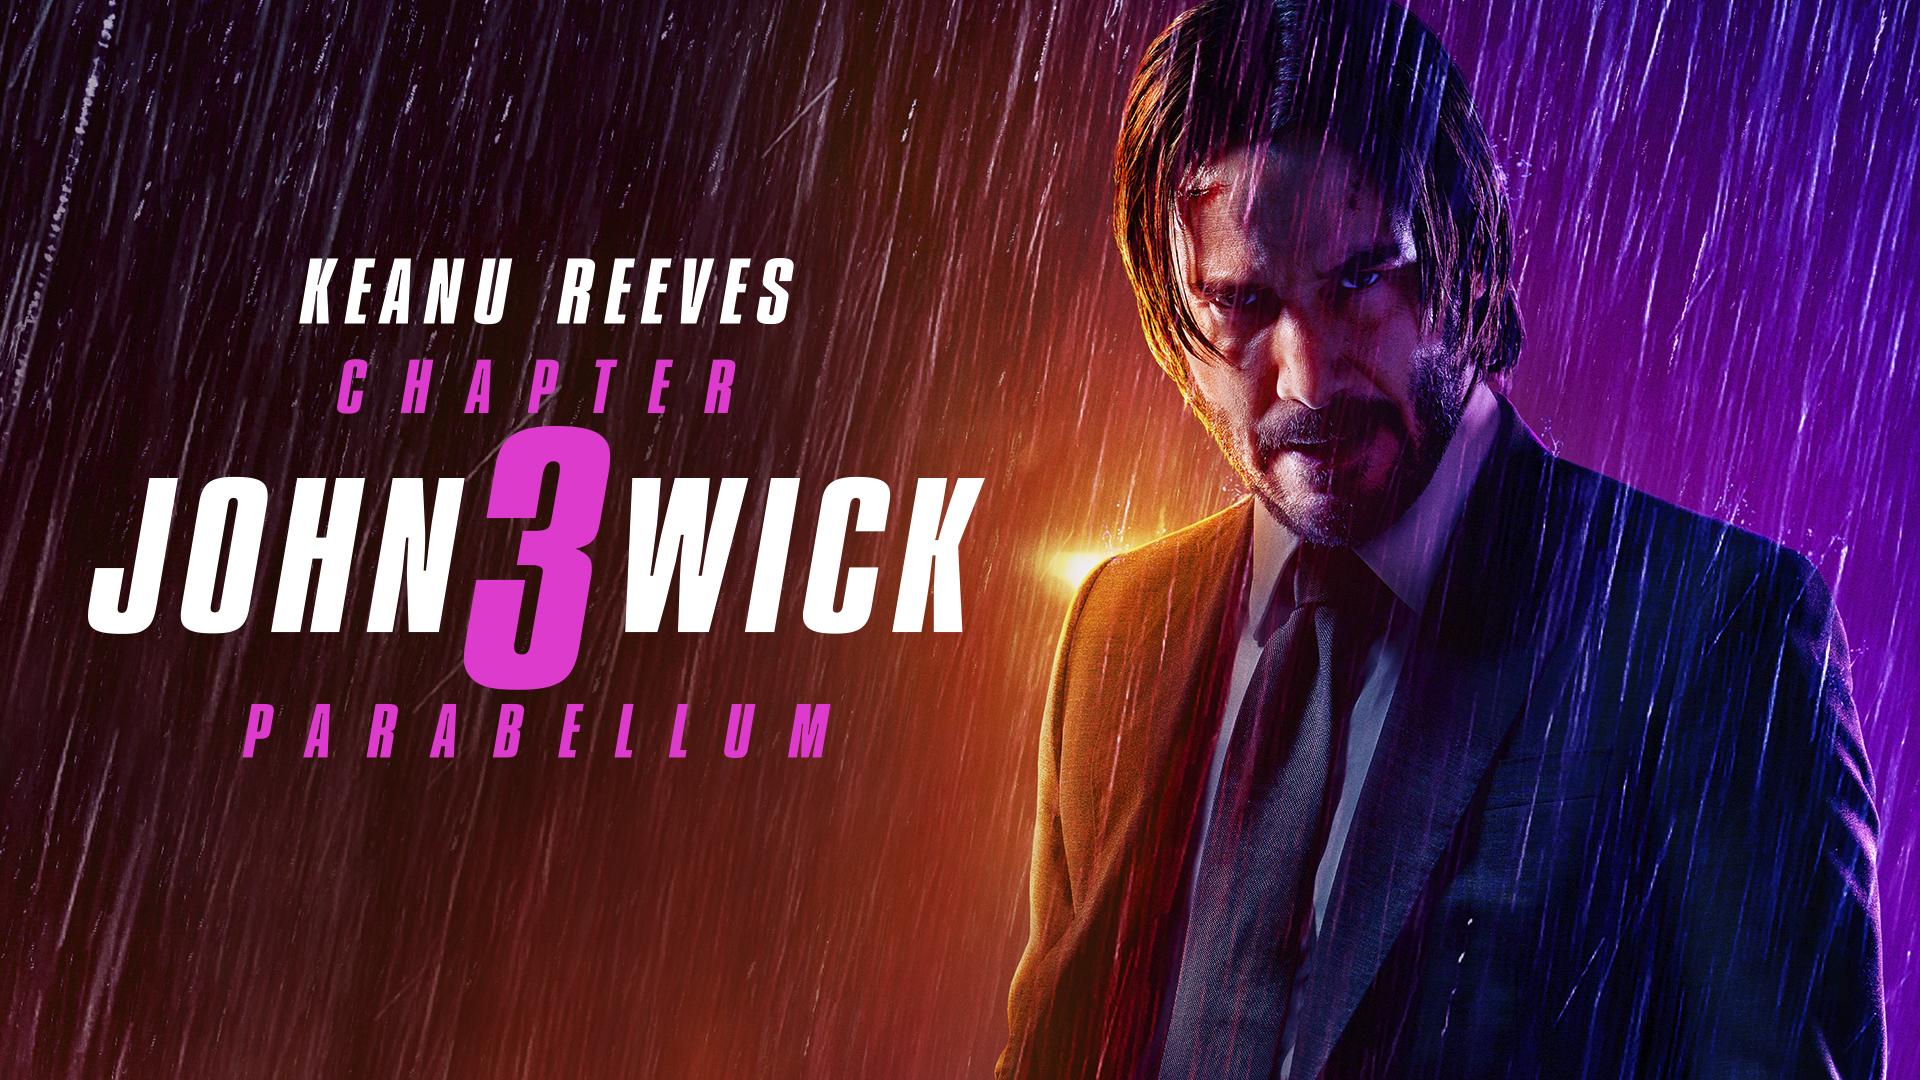 22+ Watch John Wick 2 Free  Images